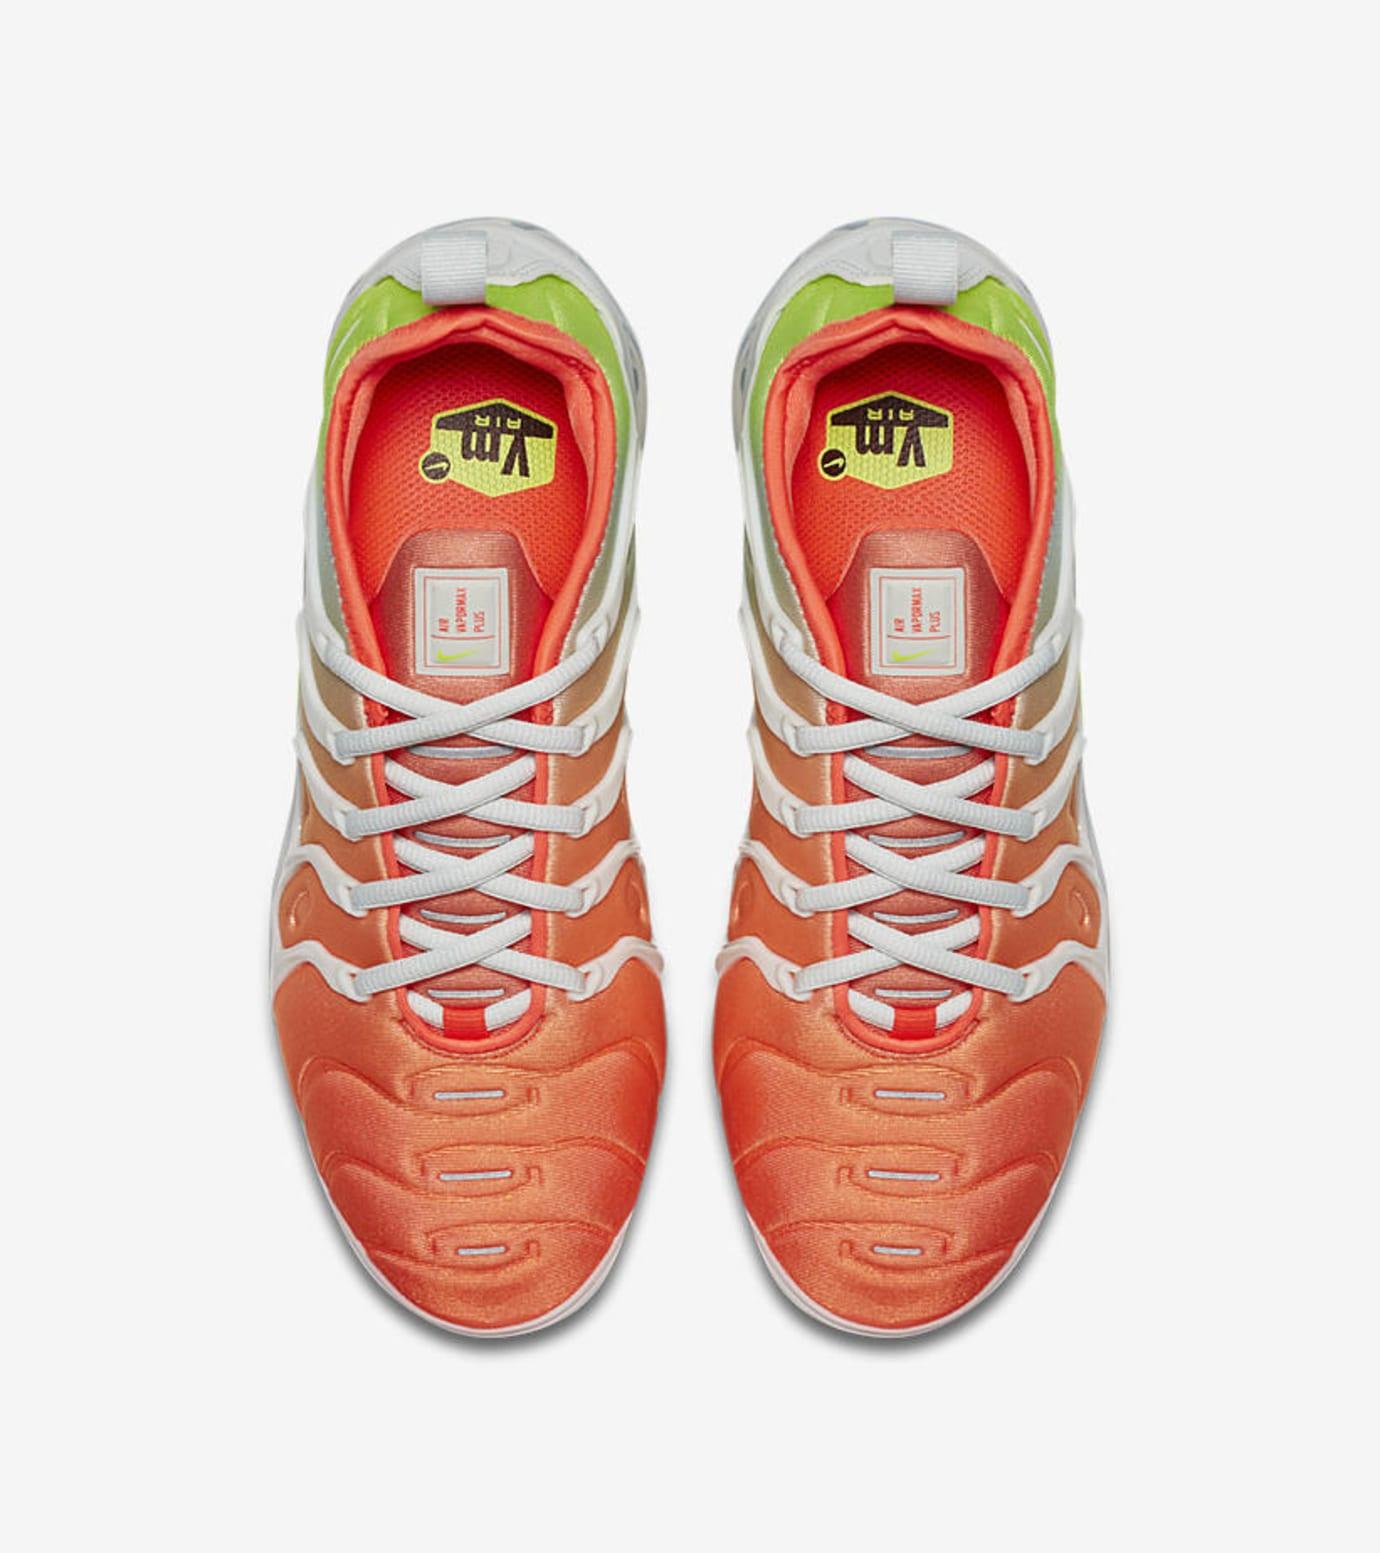 36d4307b98c8e Image via Nike Nike Air VaporMax Plus 'Barely Grey/Total Crimson'  AO4550-003 (Top